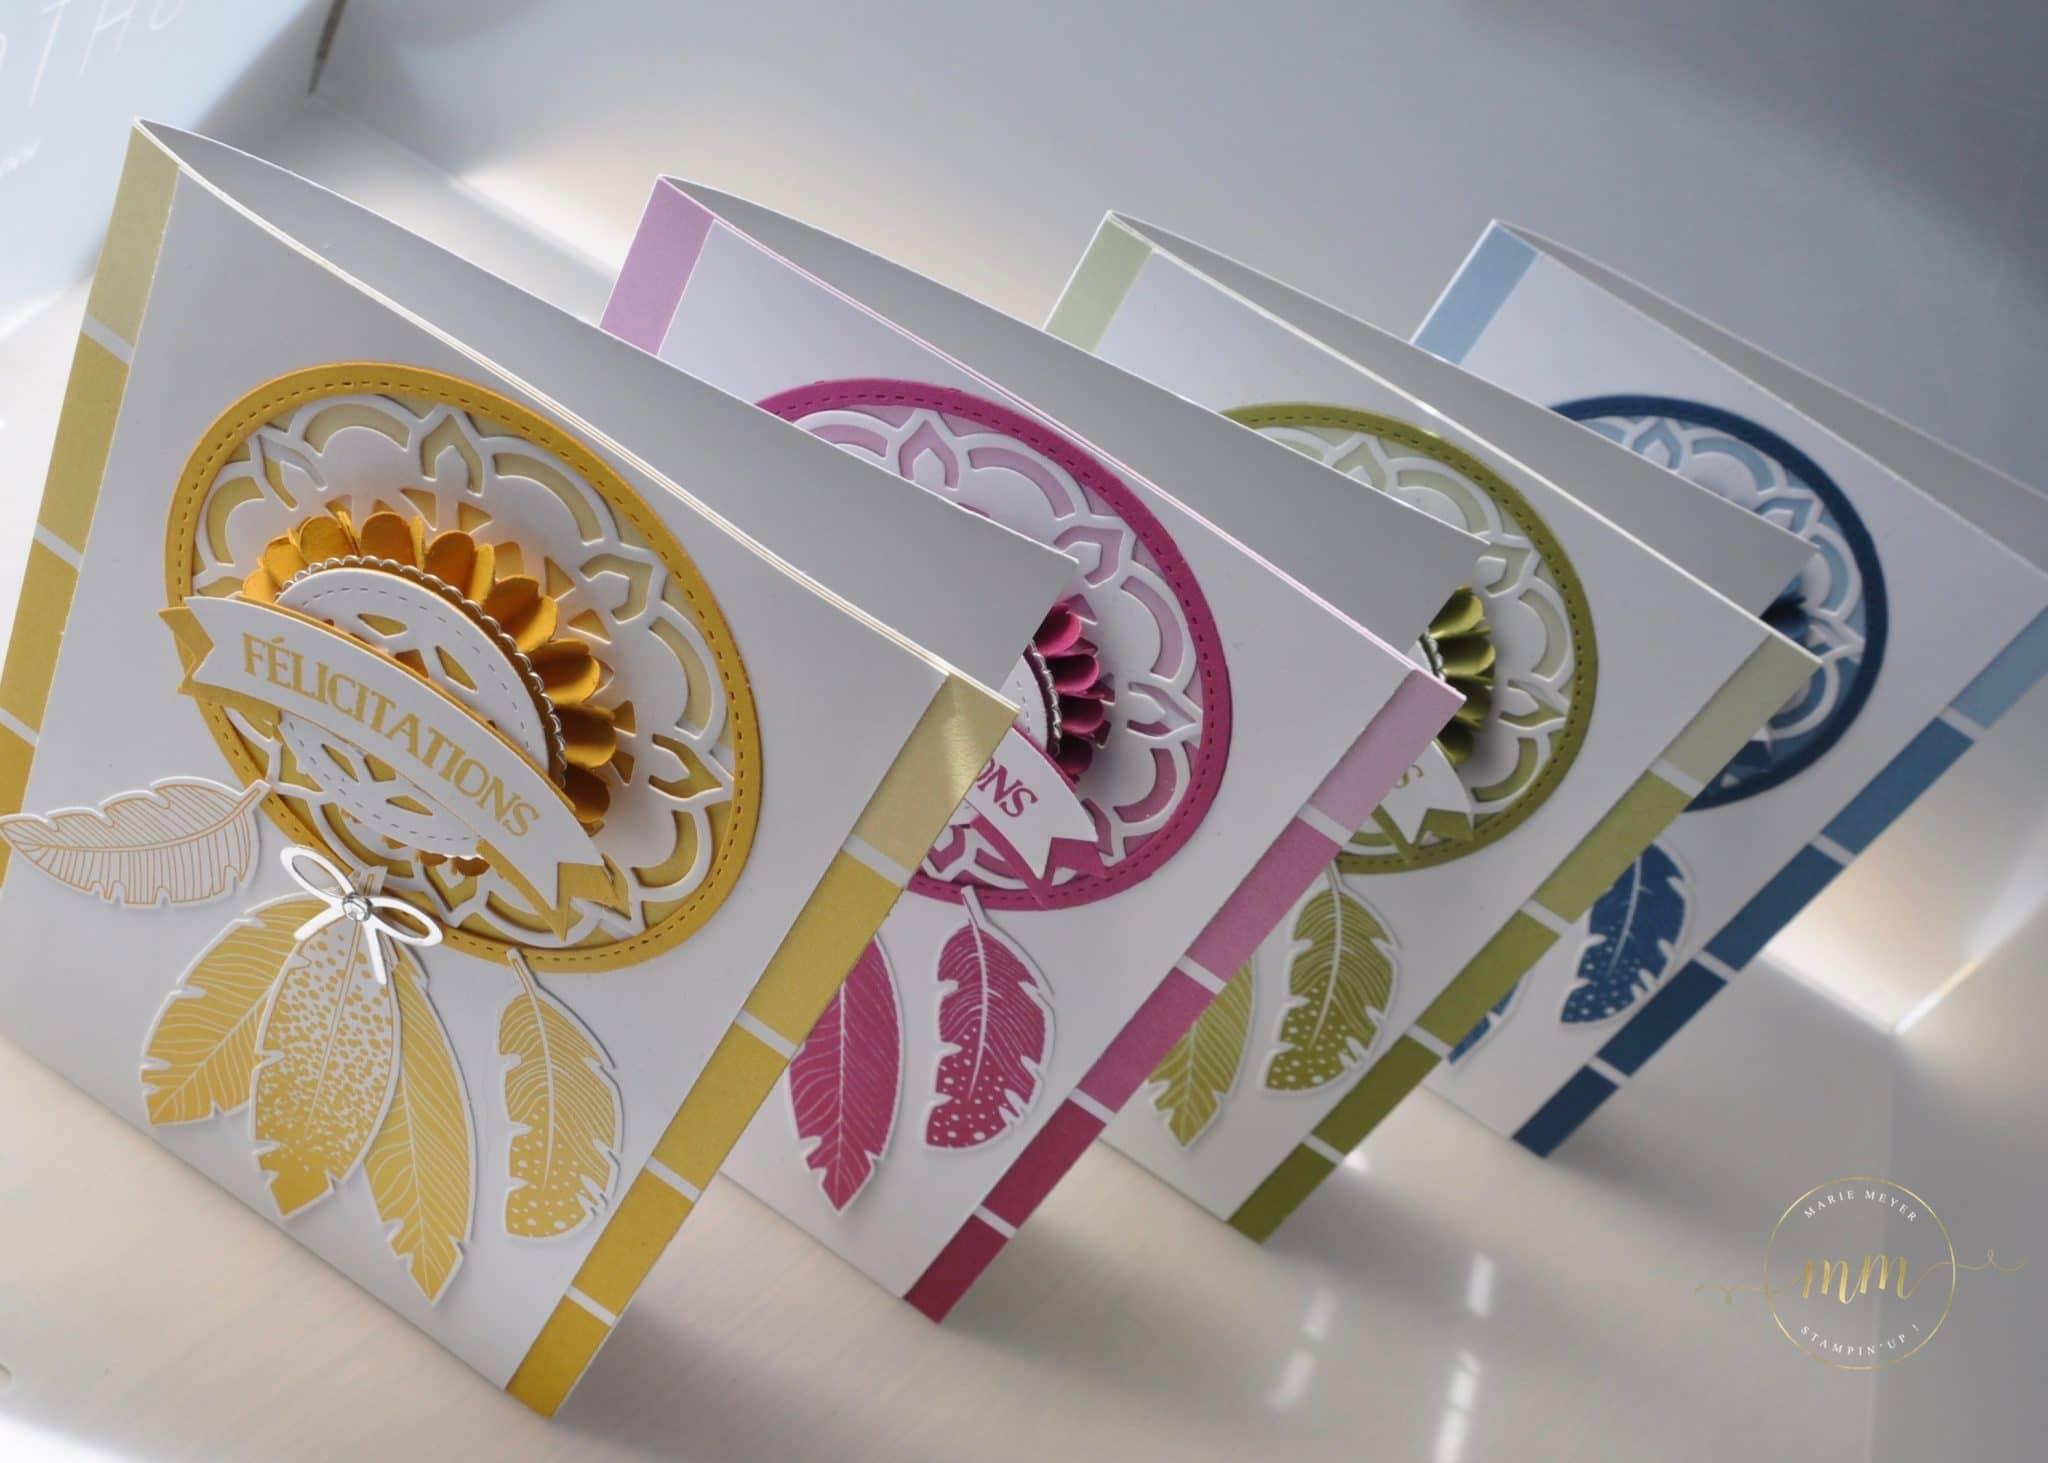 Carte attrape rêves Thinlits Médaillons de l'Orient par Marie Meyer Stampin up - http://ateliers-scrapbooking.fr/ - Dream Catcher Card - Eastern Medallions Thinlits - Color Theory Designer Series Paper Stack - Traumfänger karte Thinlits Orient-Medaillons - Designerpapier im Block Farbenspiel